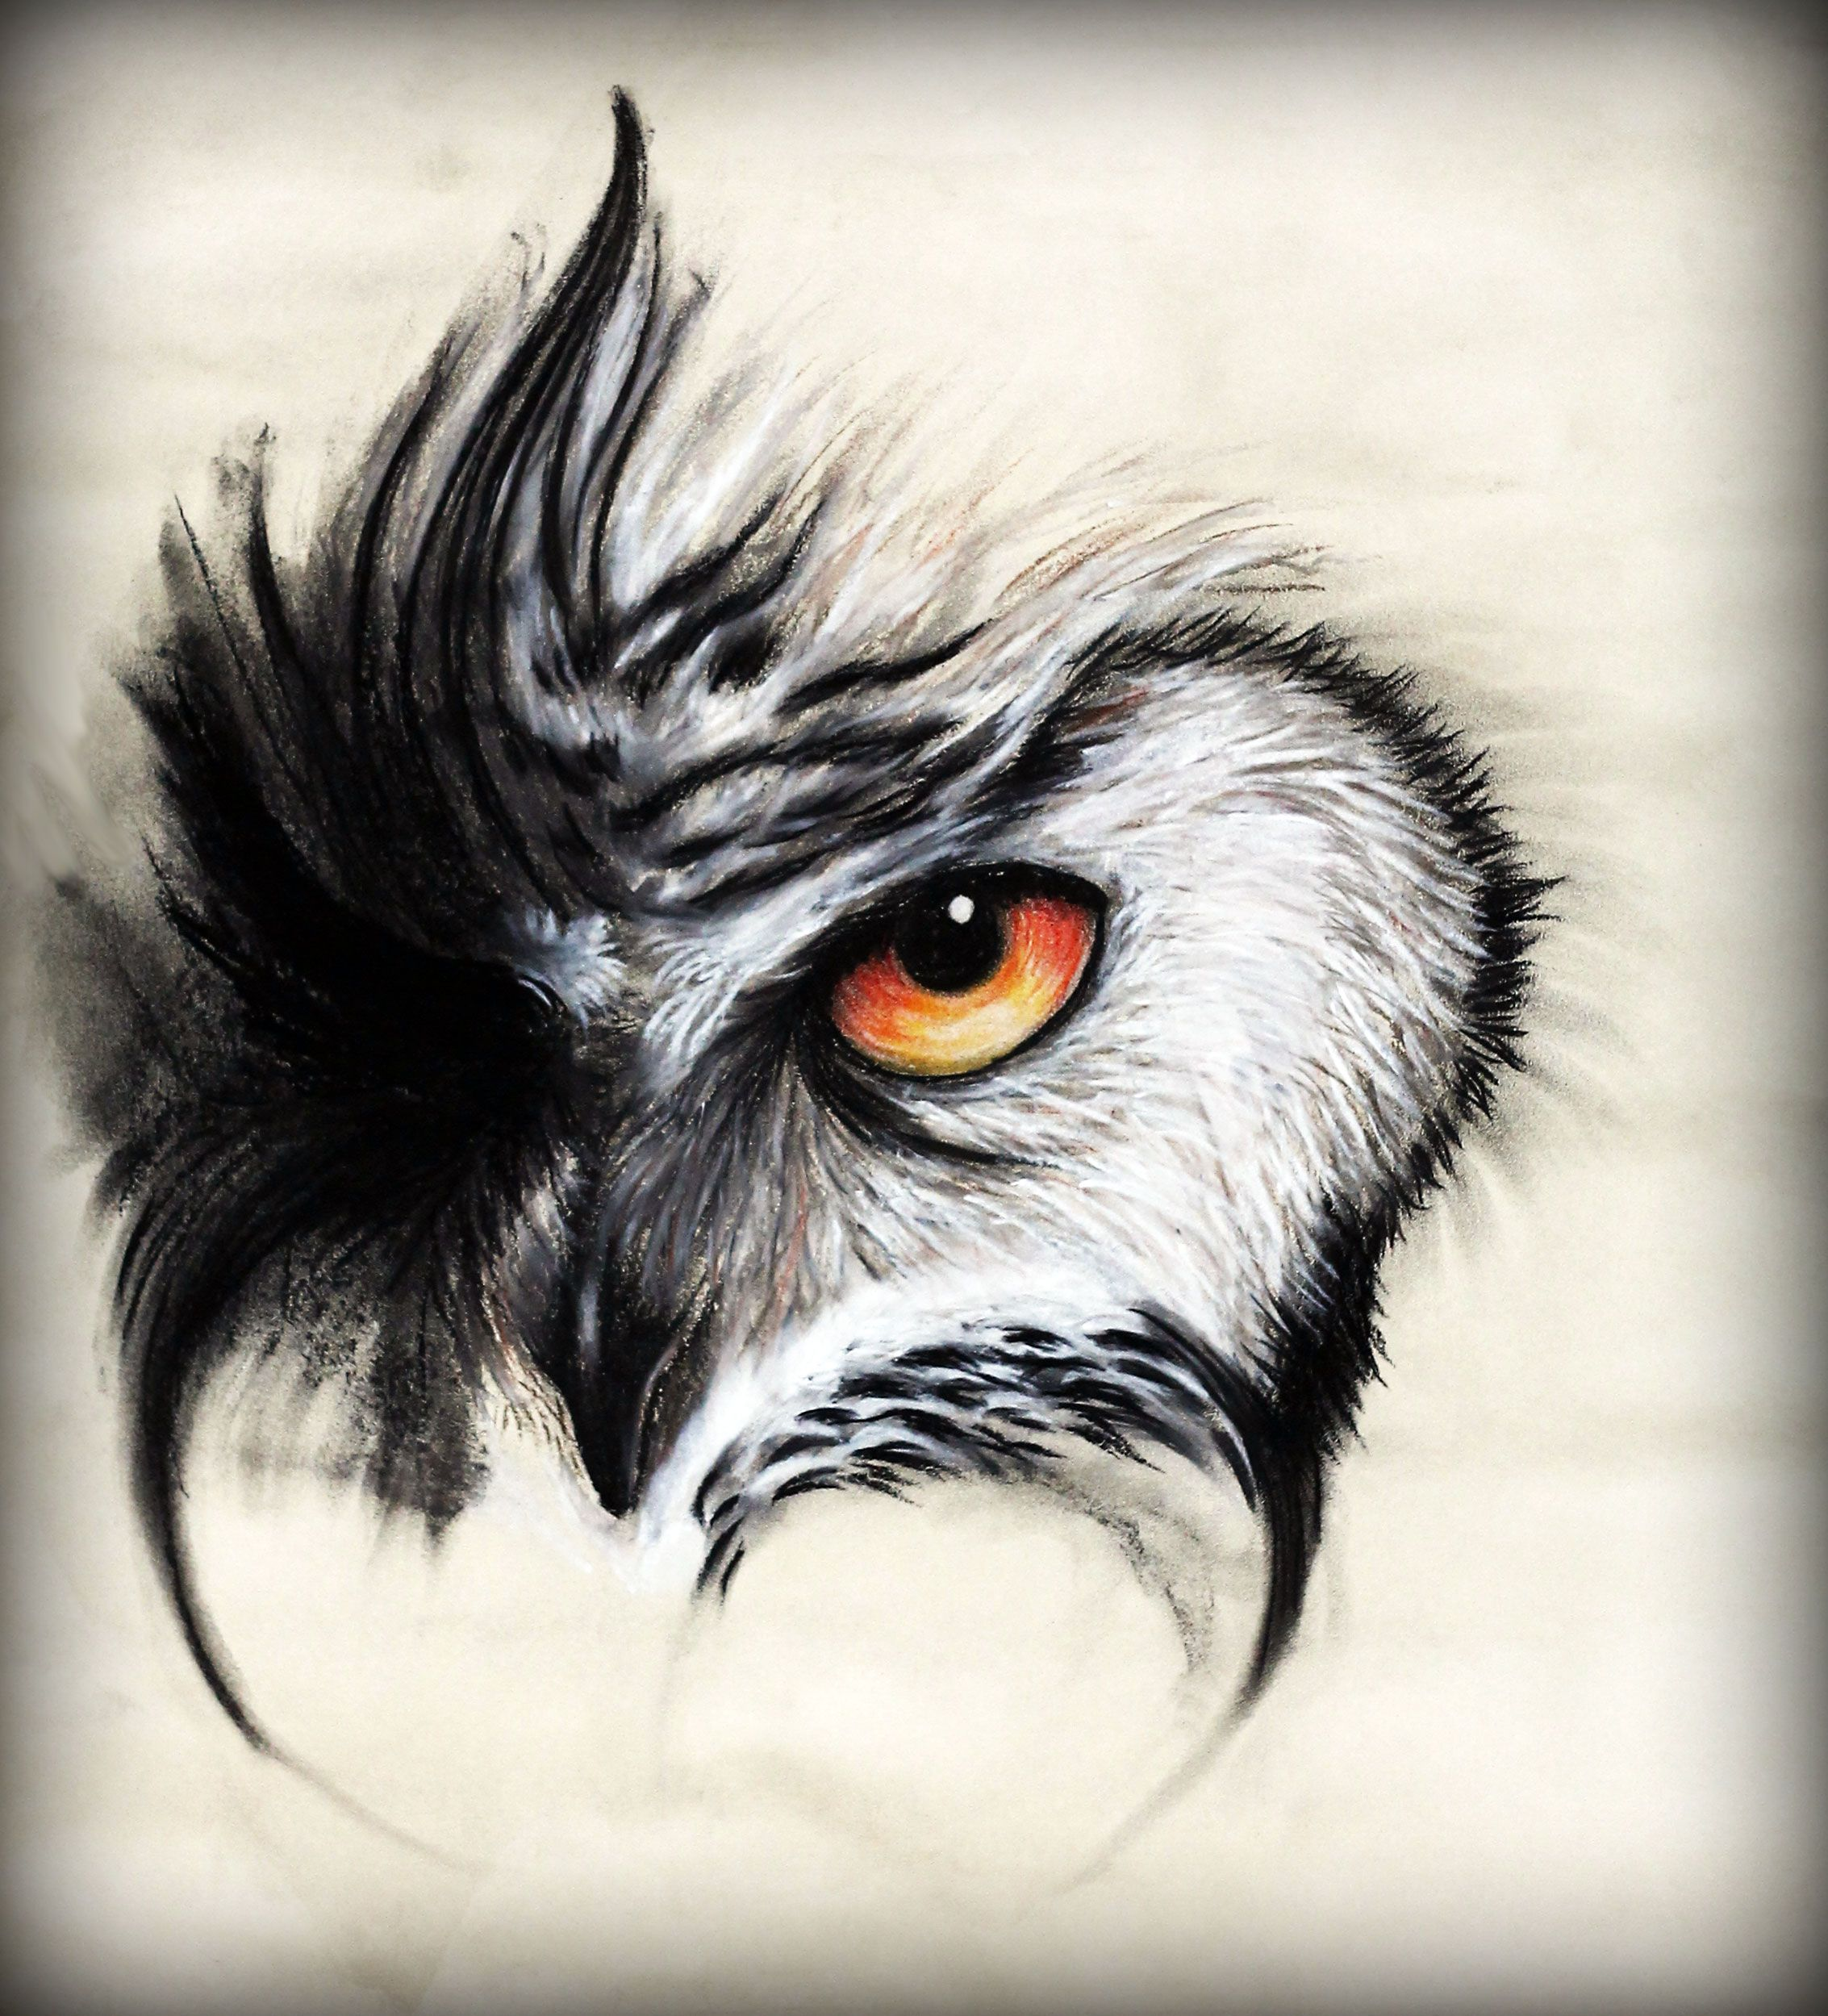 Facebook Https Www Facebook Com Nicolasgabrielart Ref Hl Owl Tattoo Owl Eyes Owl Tattoo Design